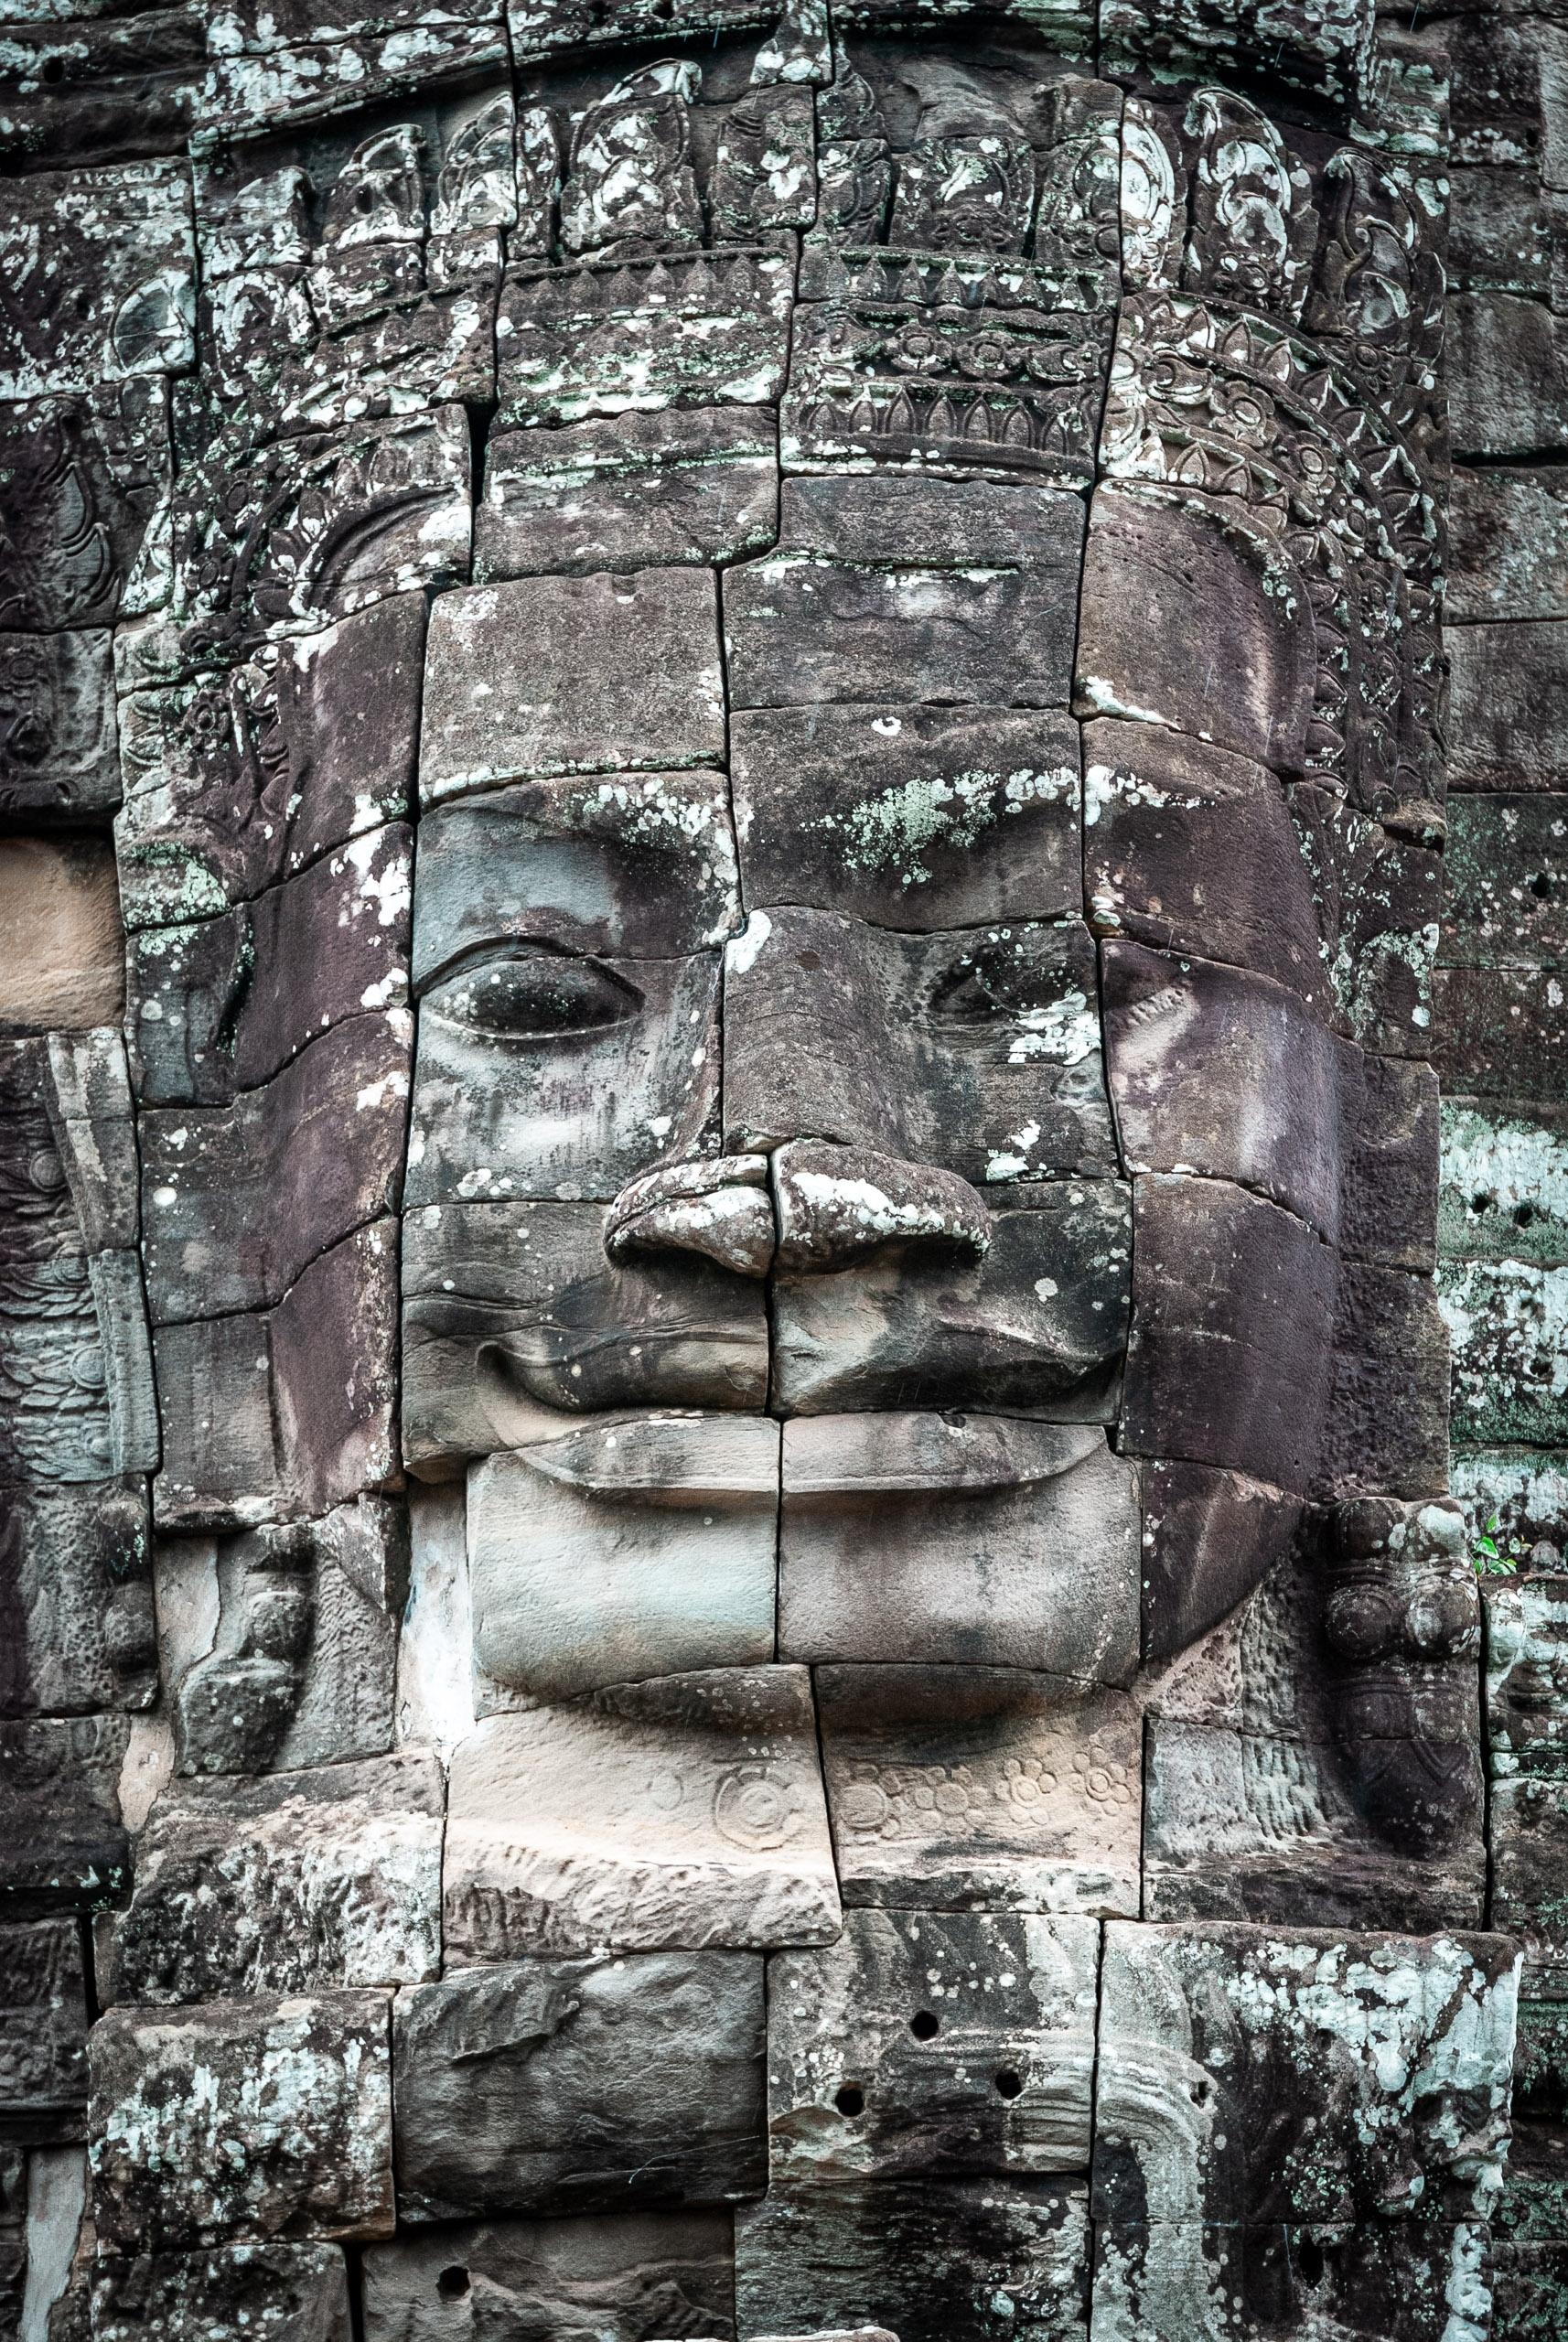 Cambodia - Angkor Wat - 2007-0626-DSC_0441_82394